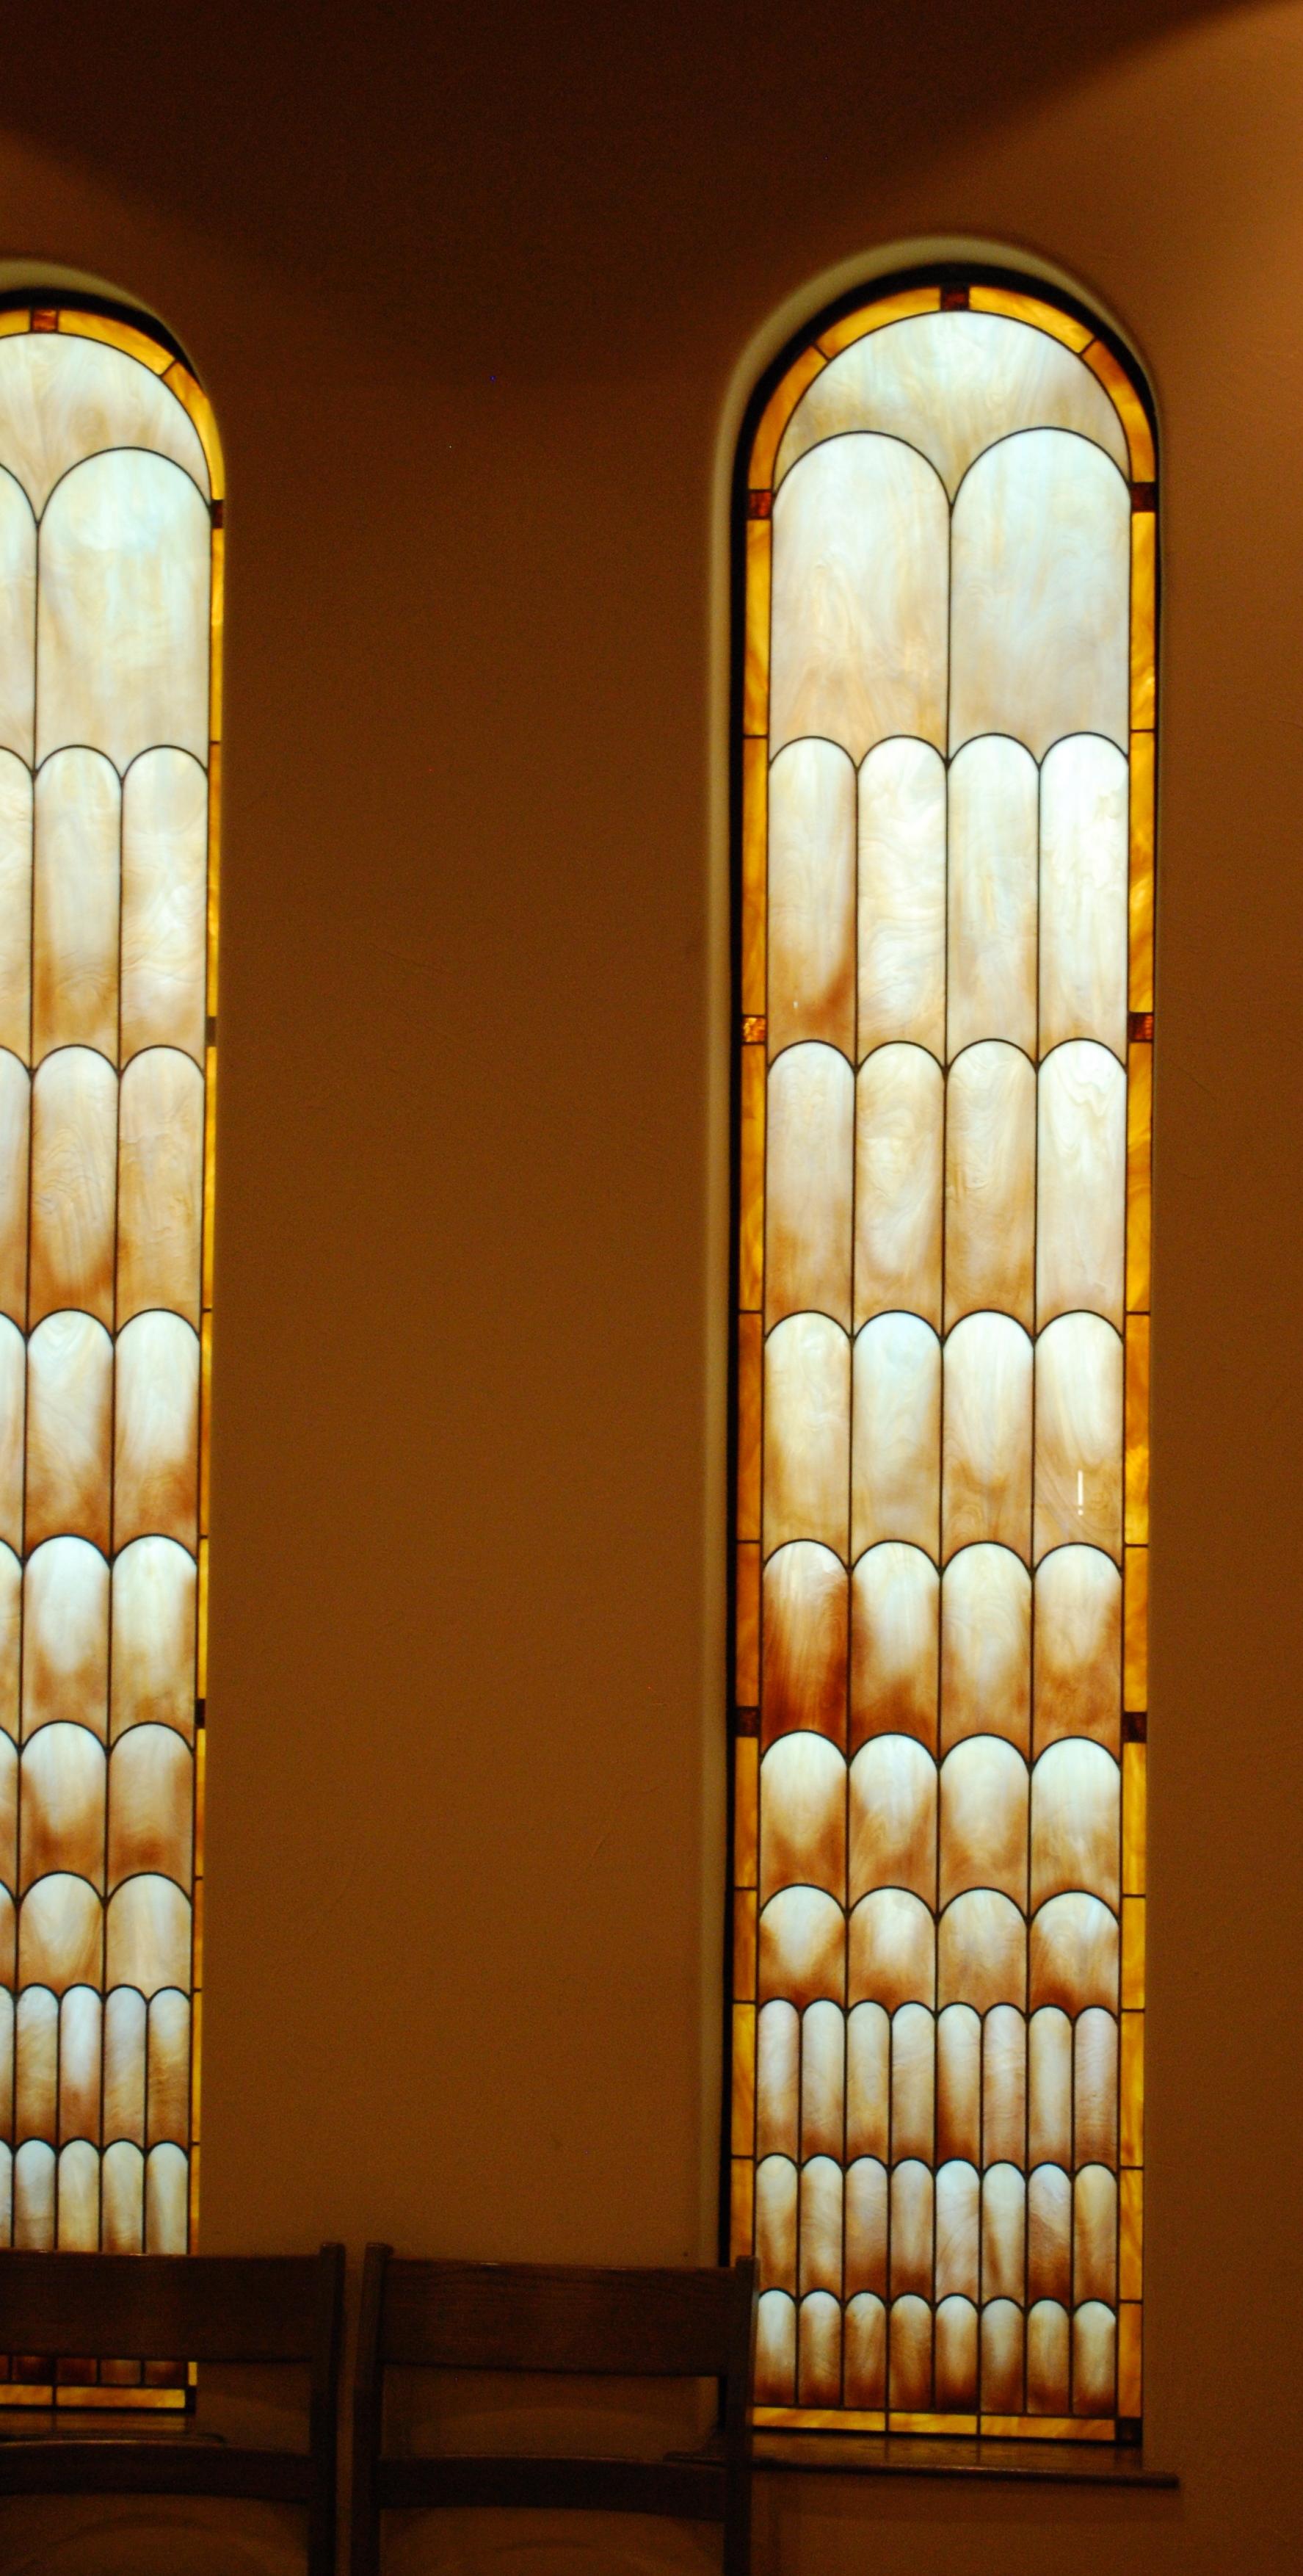 Alter Window